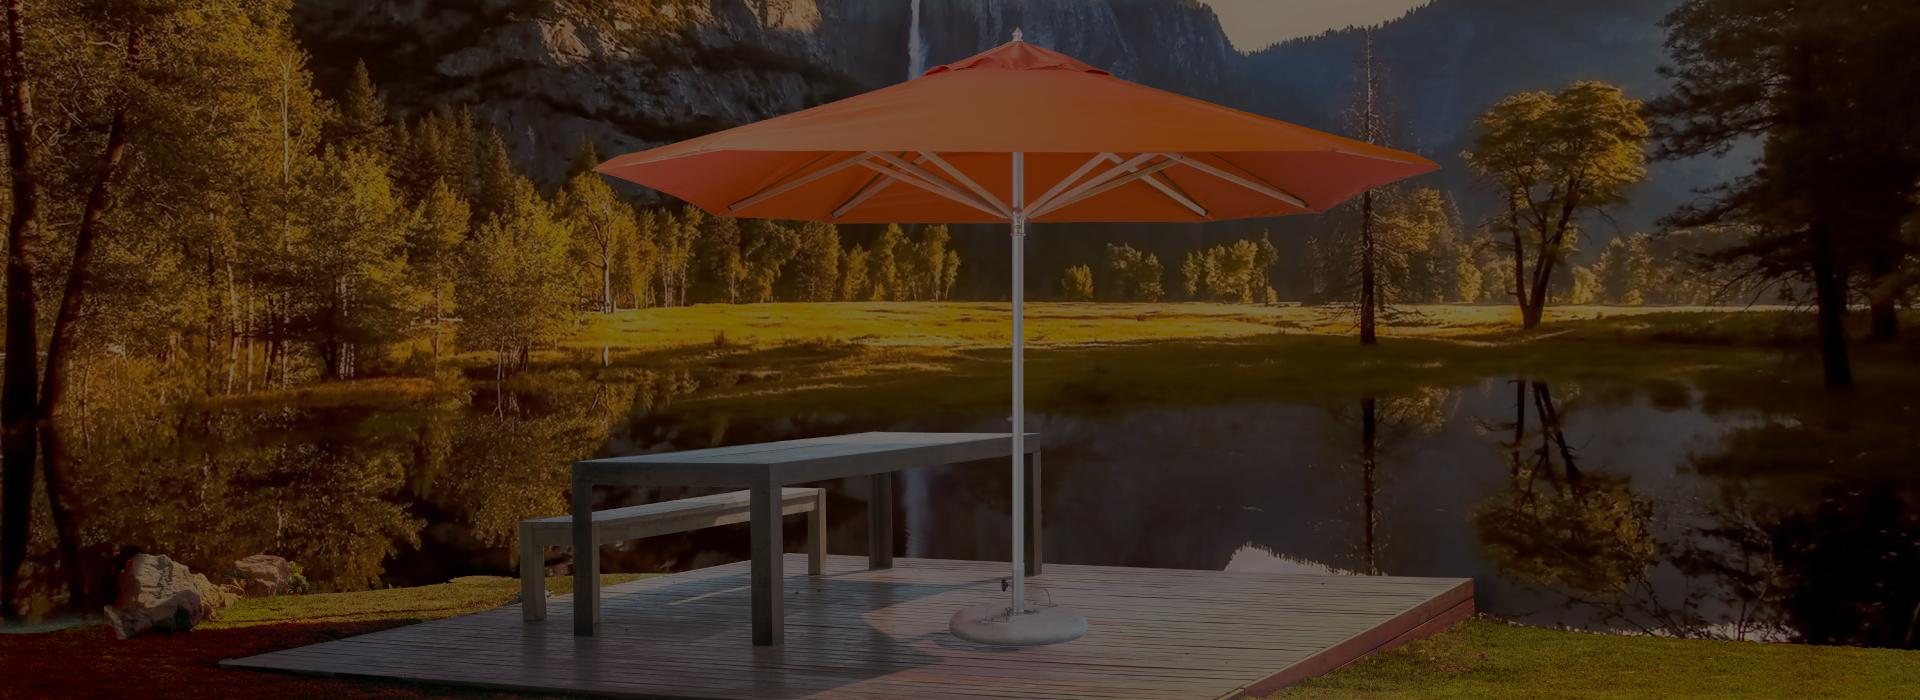 2019 Mald Square Cantilever Umbrellas Throughout Cape Umbrellas – Cape Umbrellas (Gallery 18 of 20)